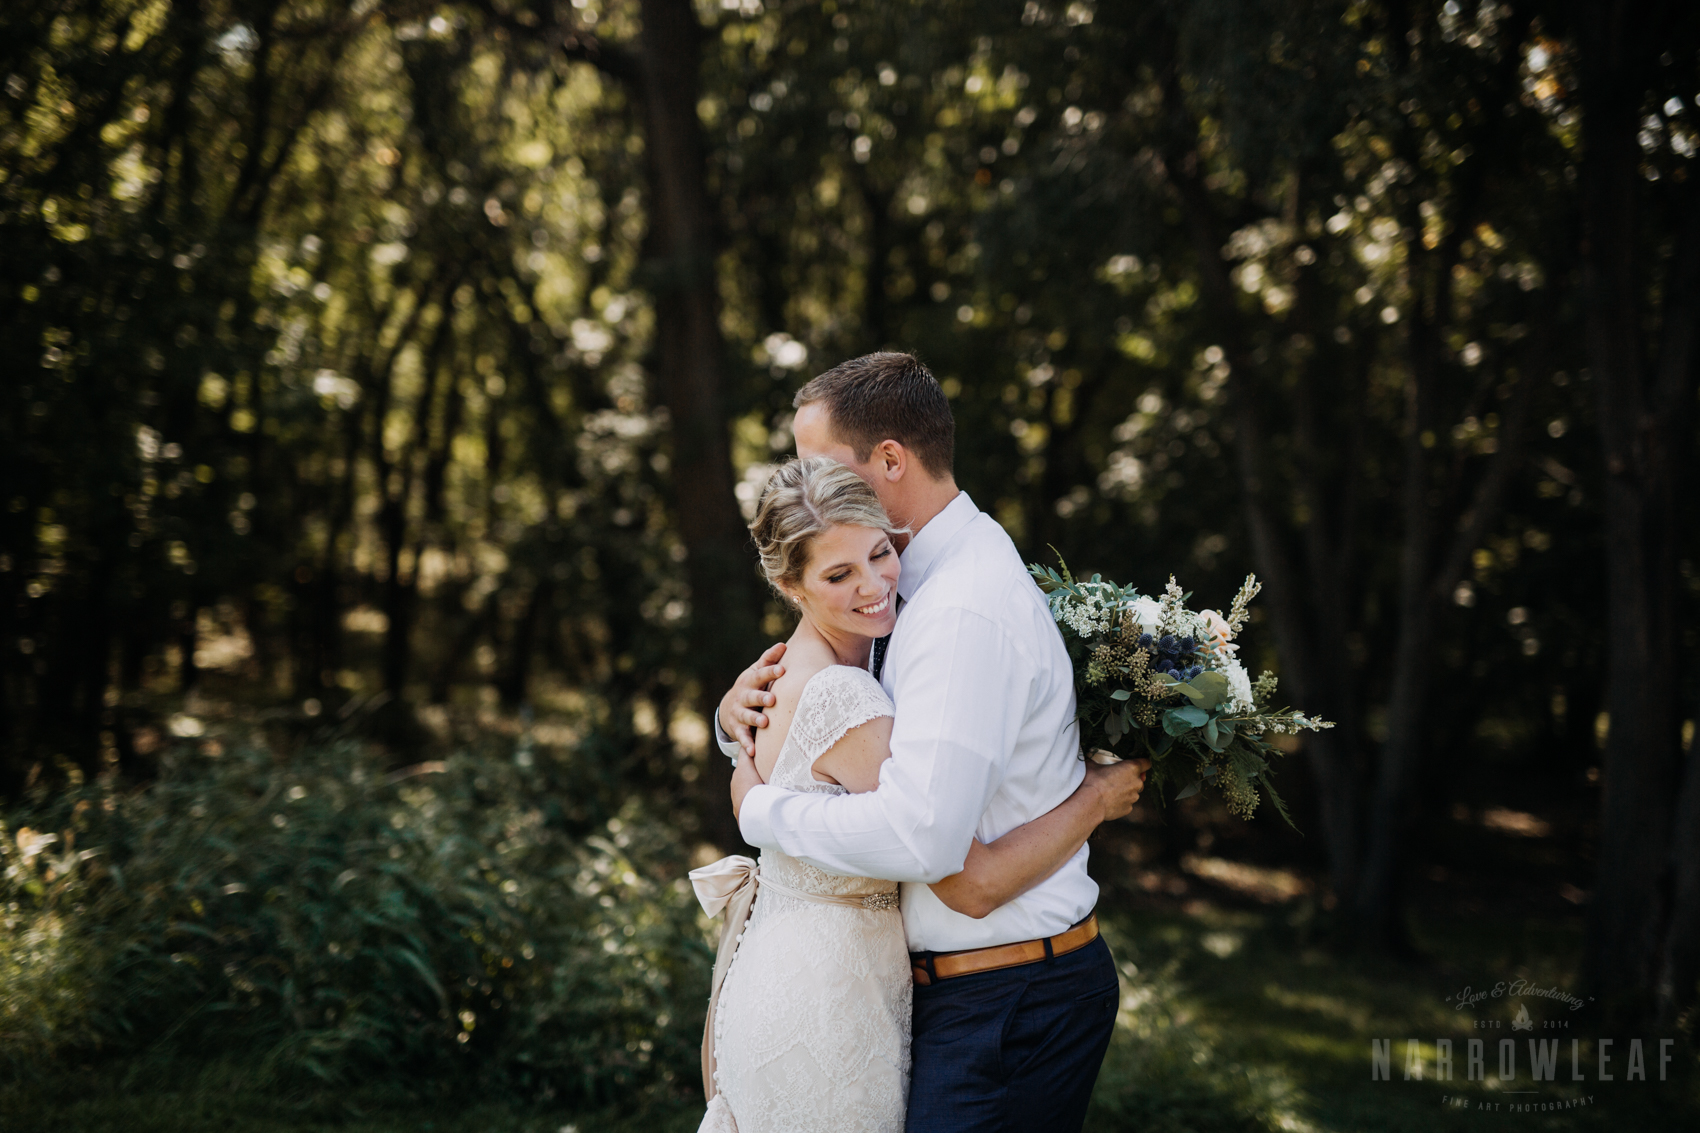 bride-groom-classy-wedding-photos-outdoors-32.jpg